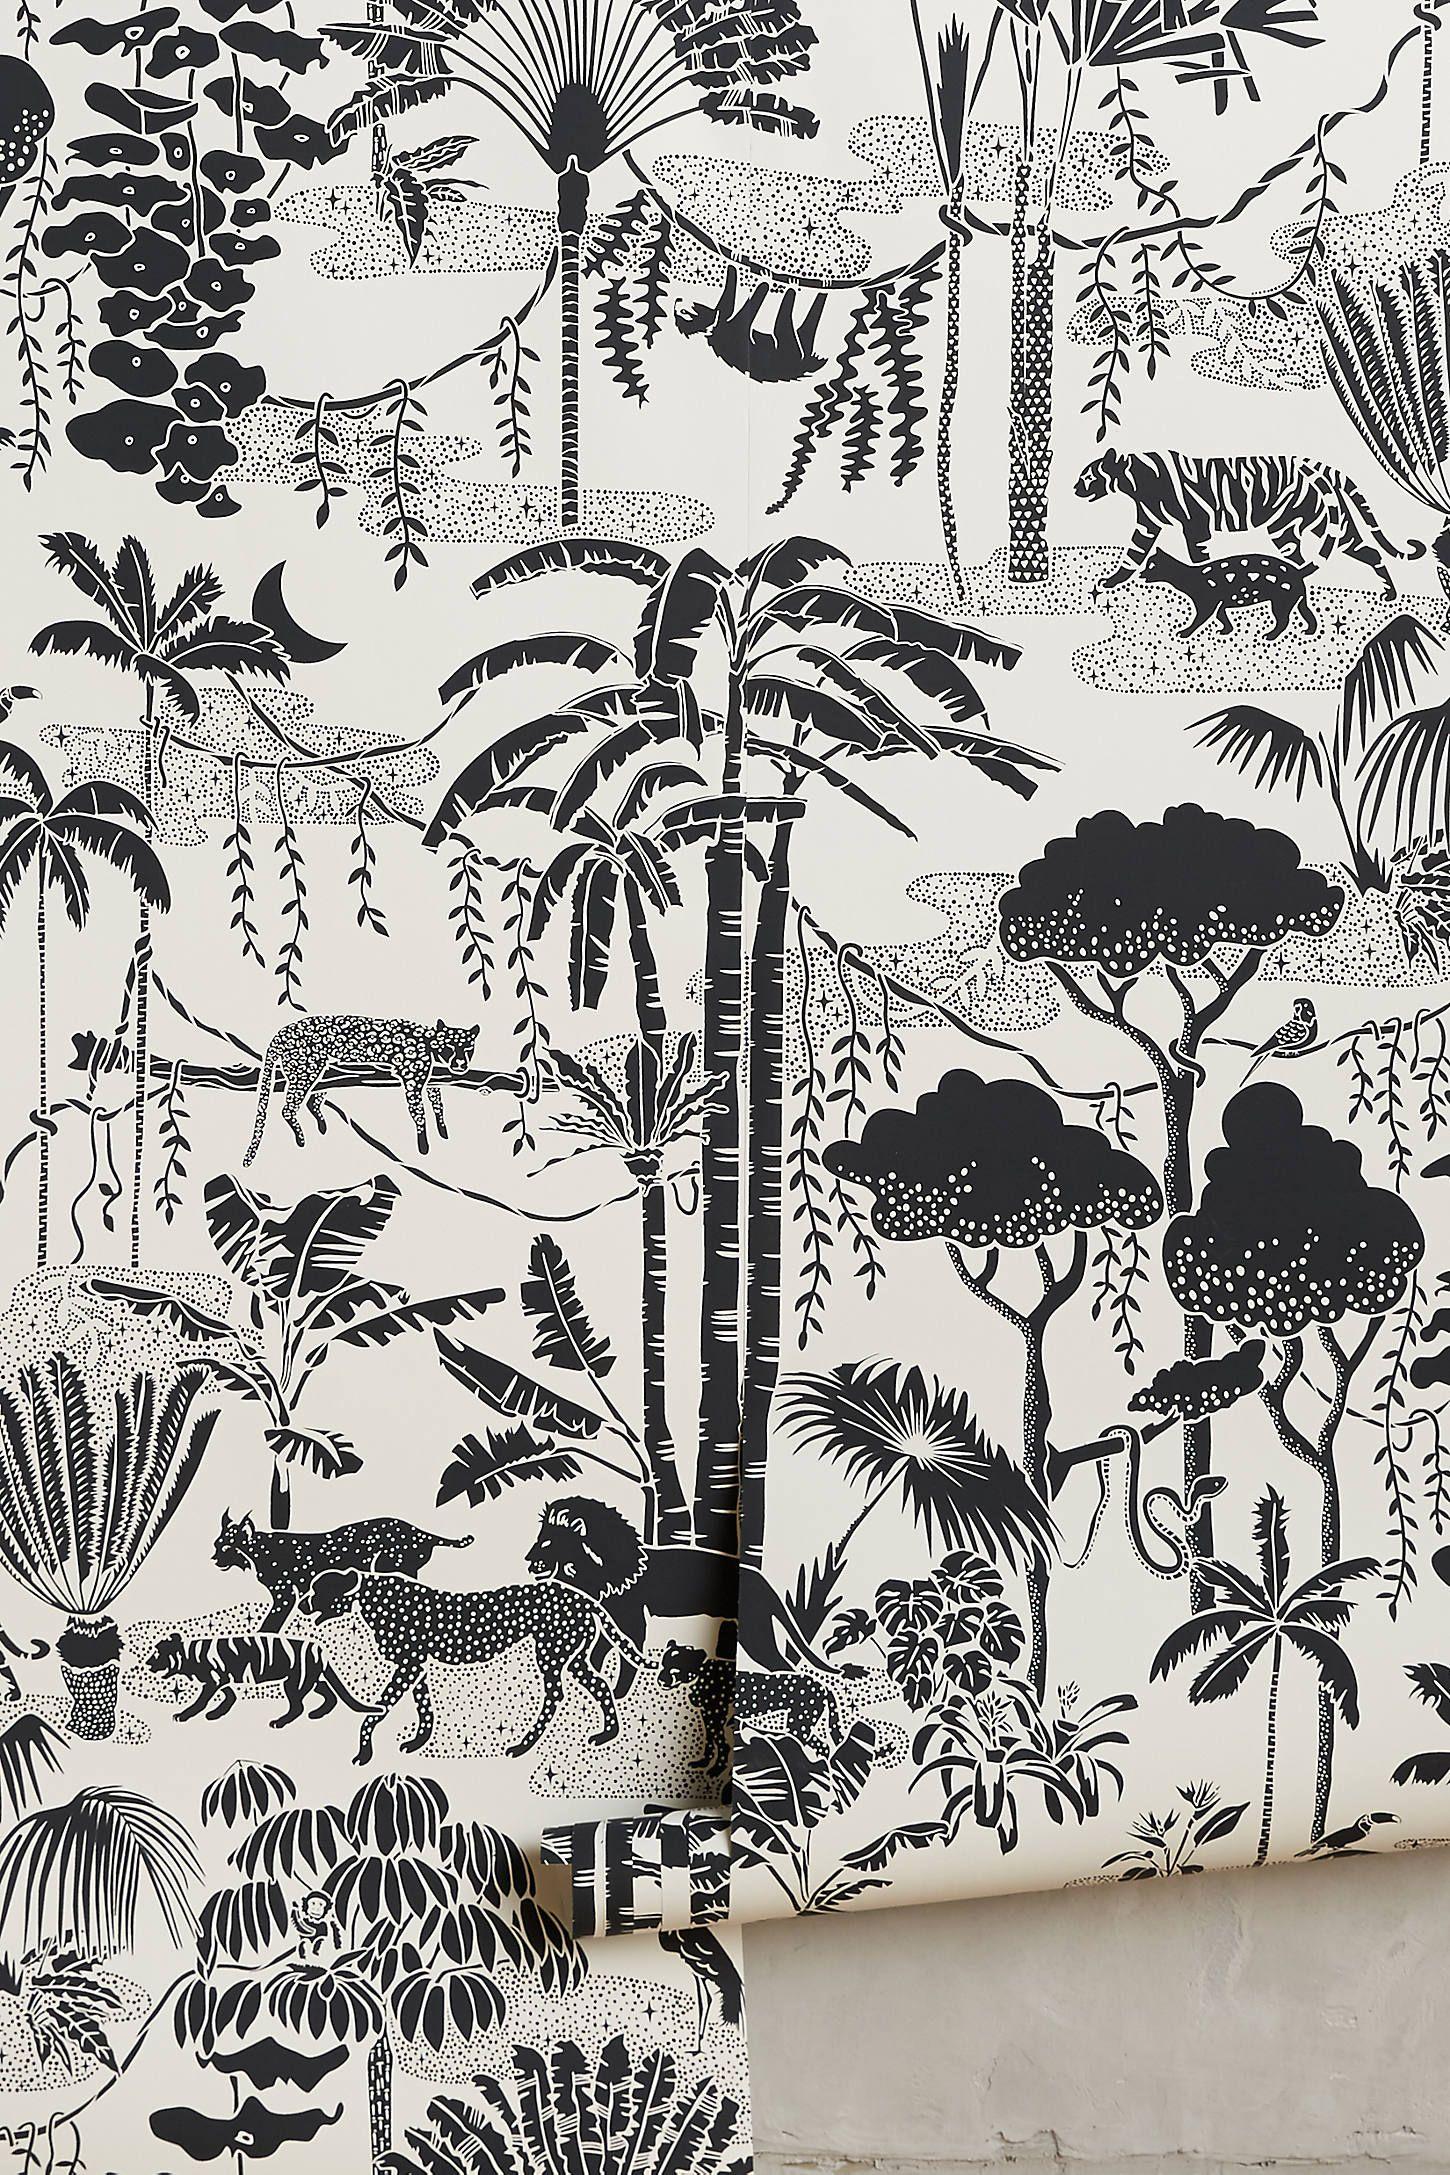 Jungle Dream Wallpaper in 2020 | Jungle wallpaper, Print ...